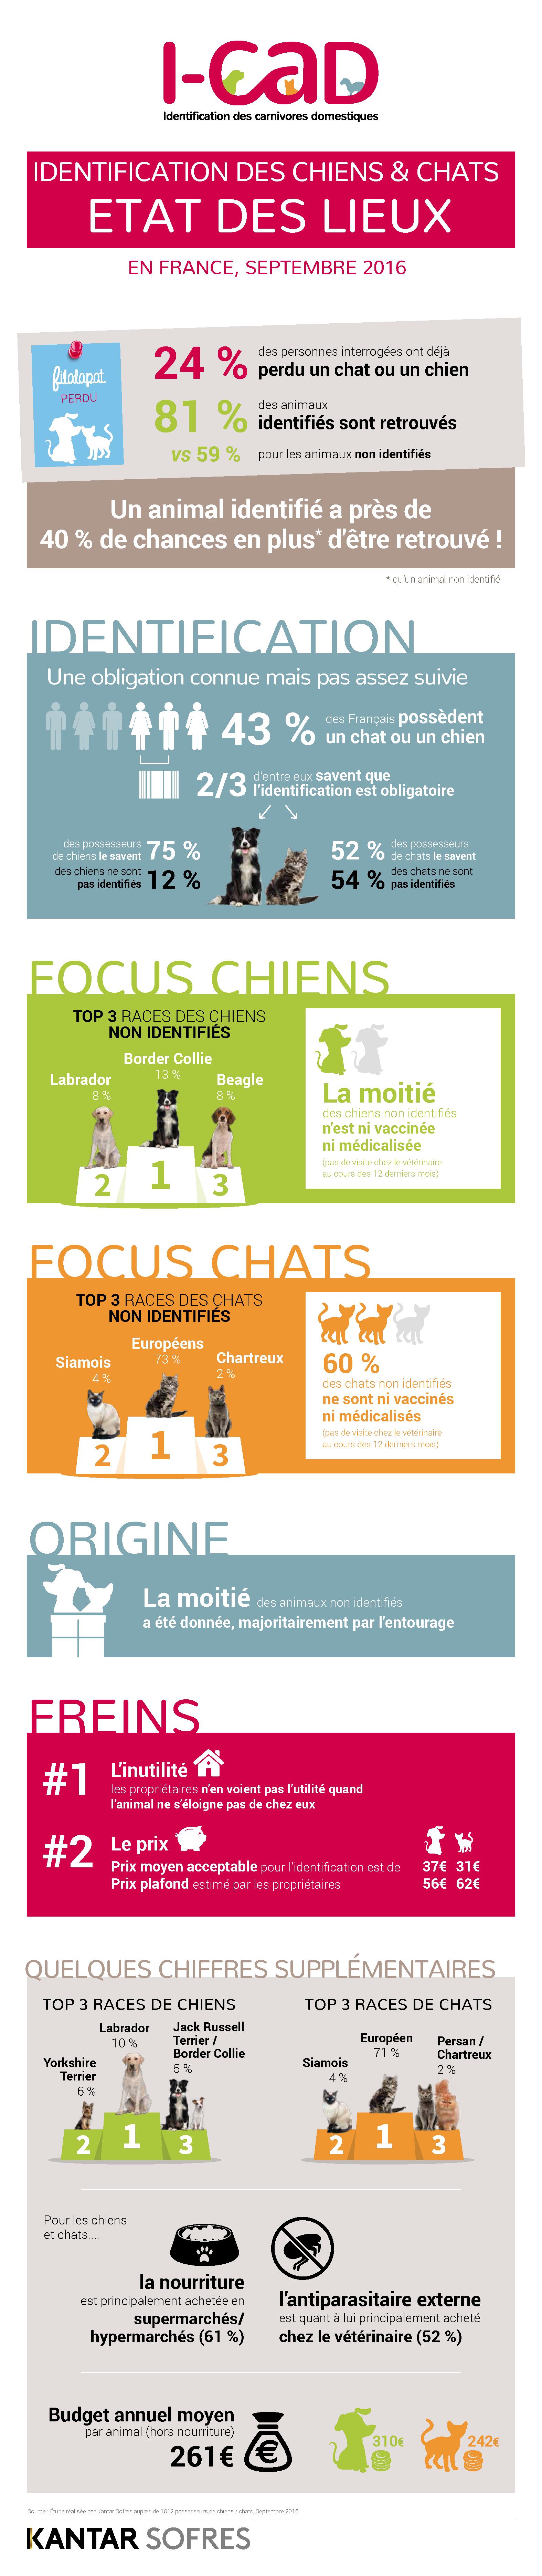 infographie-i-cad-2016-city-pattes